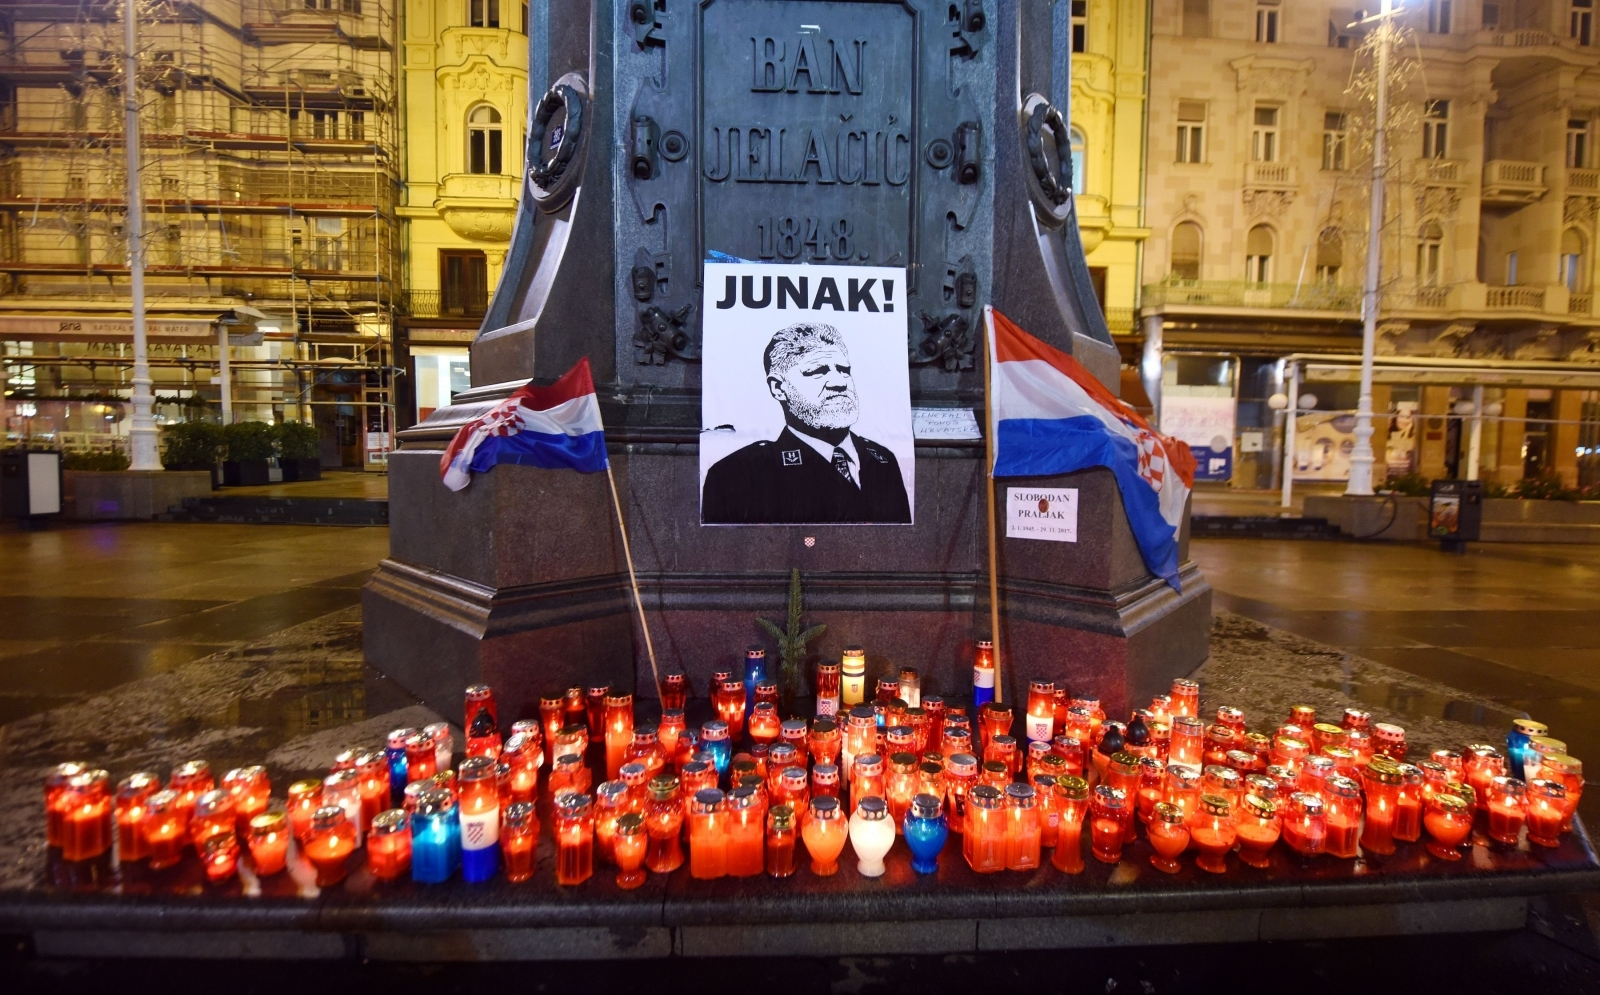 War crimes convict Slobodan Praljak died of cyanide poisoning